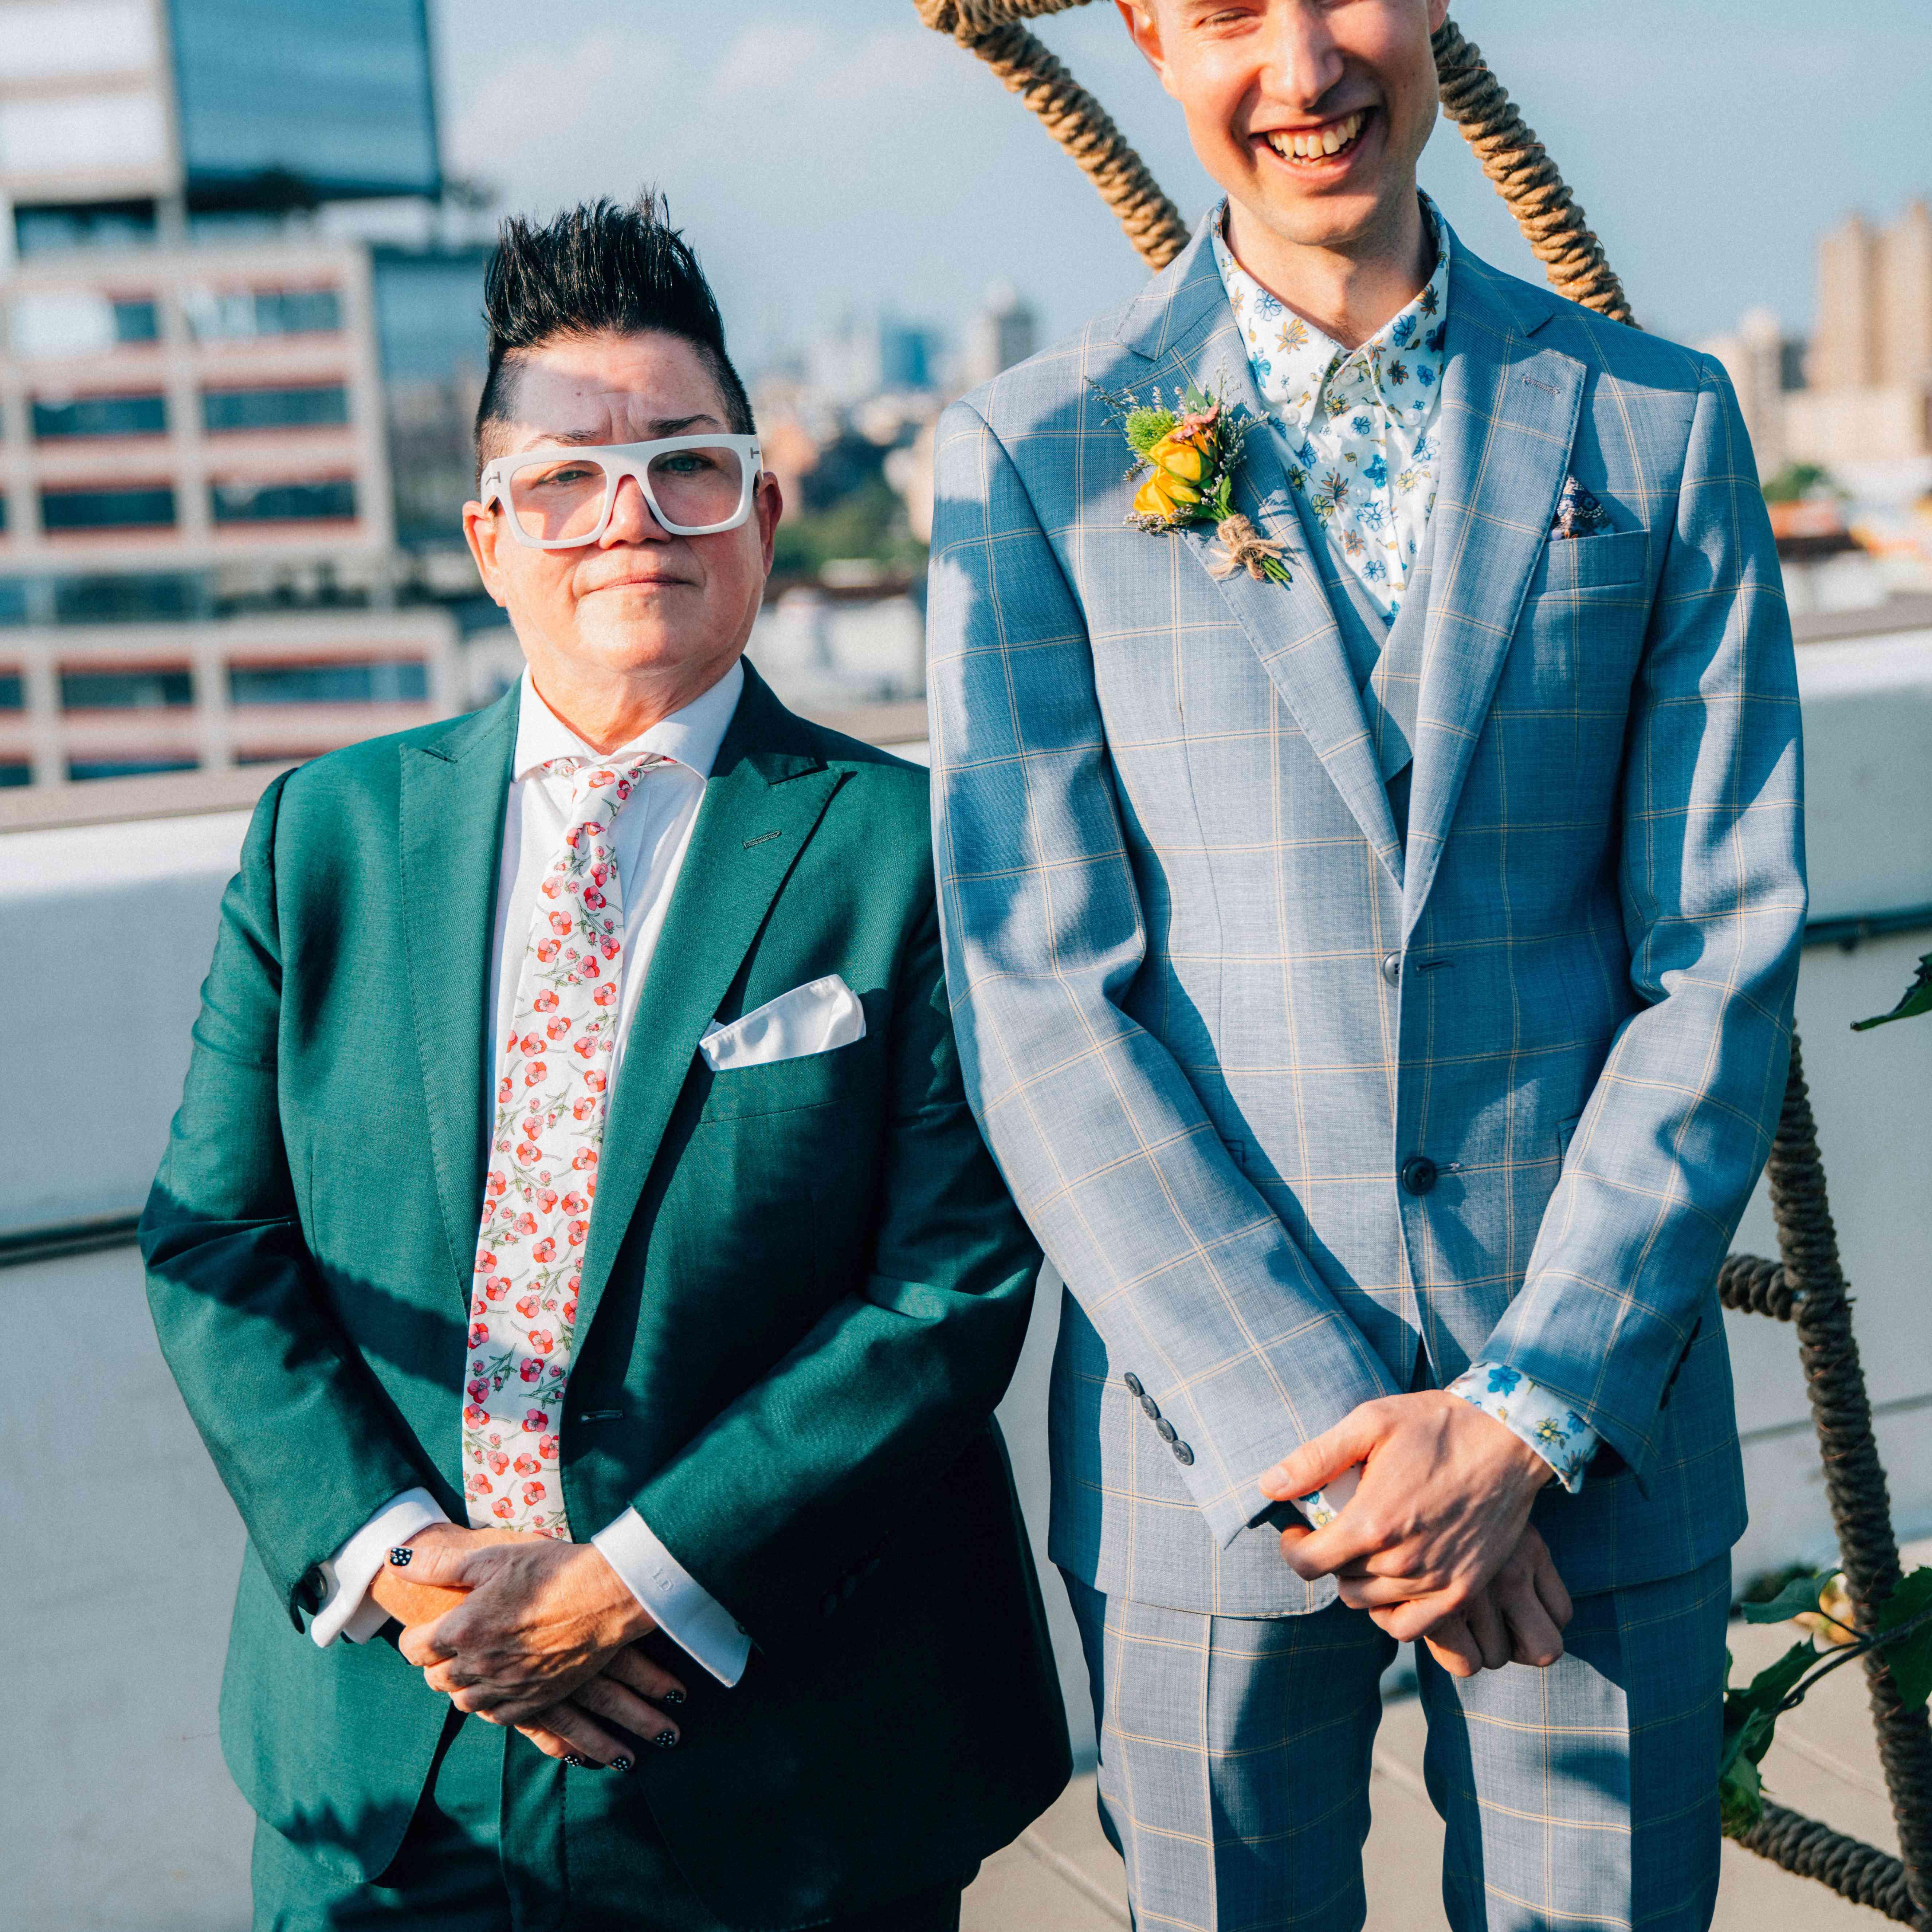 emma myles wedding officiant